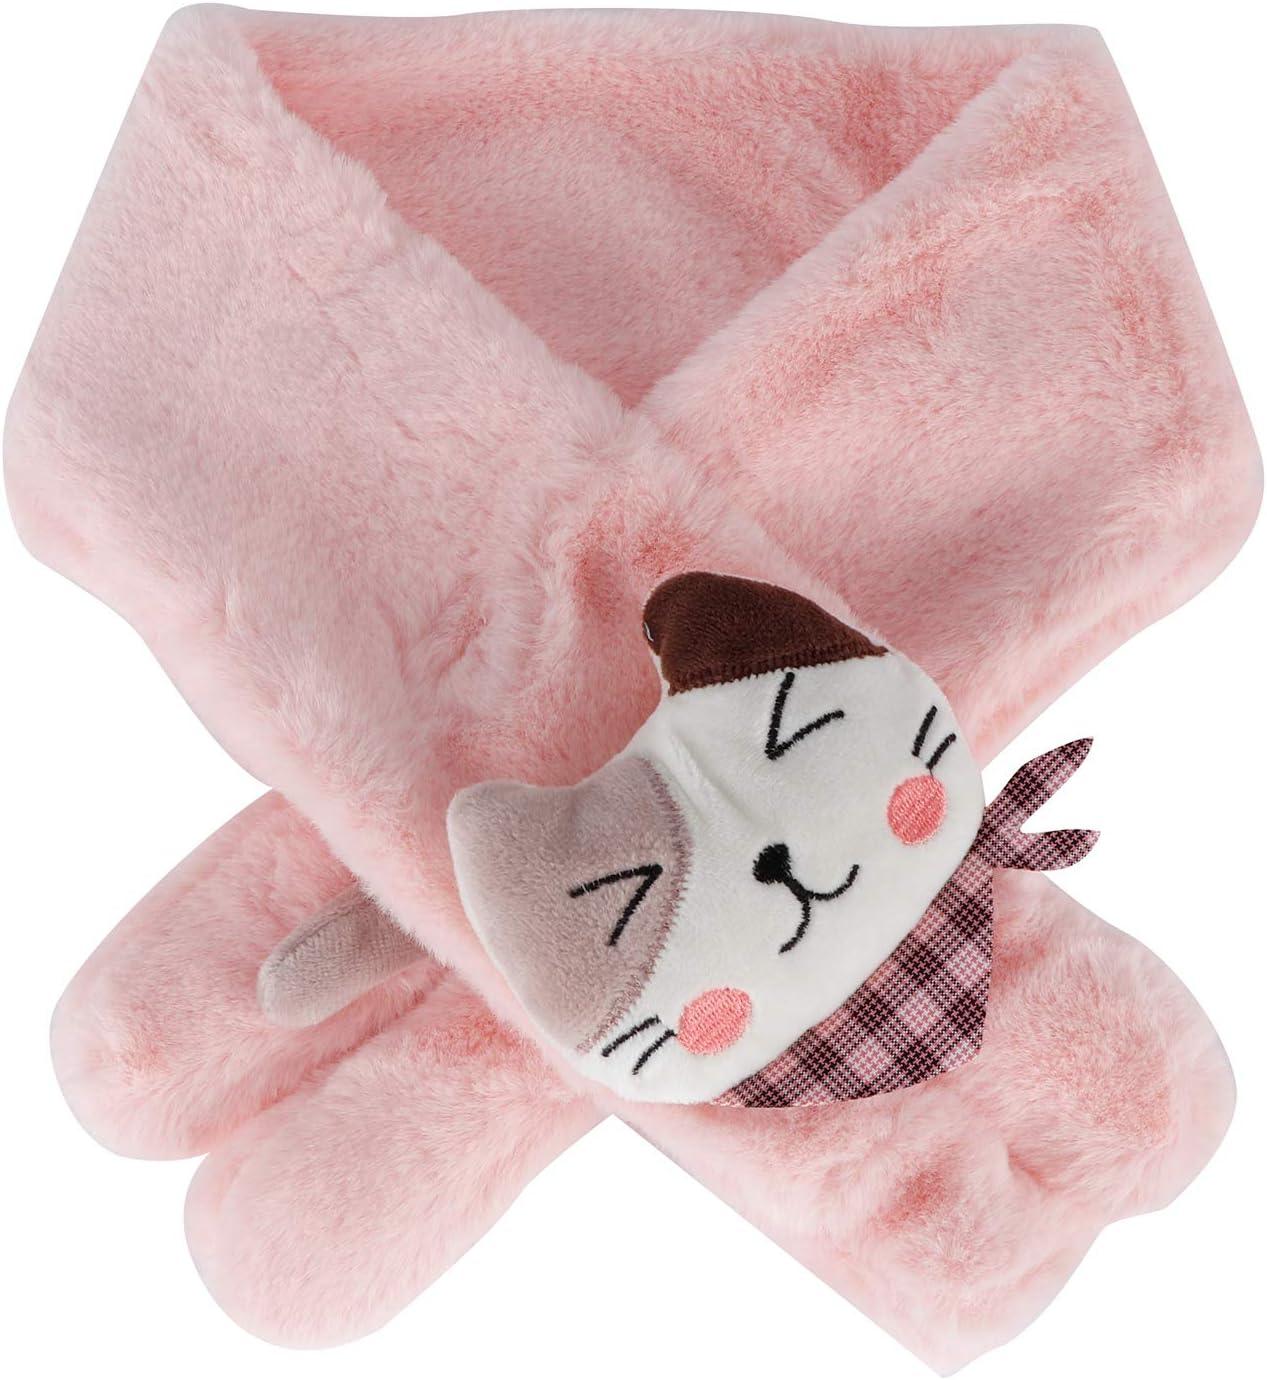 SanZHONGsd Kids Scarf Fluffy Furry Neck Max Direct sale of manufacturer 78% OFF Warmer Cute Rabbit